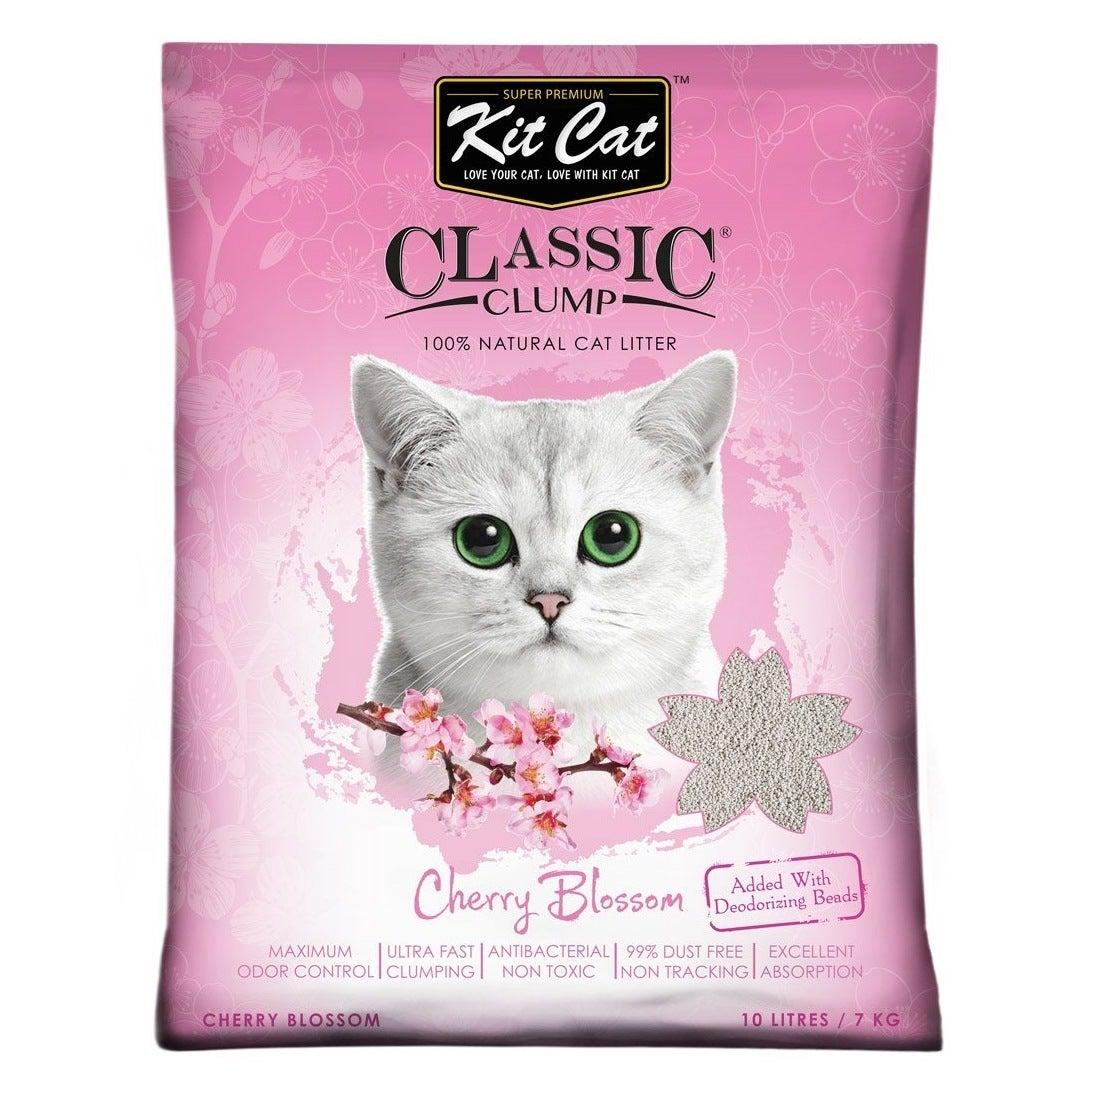 Kit Cat Ultra Fast Classic Clumping Bentonite Cat Litter 10 litres/7kg - Cherry Blossom